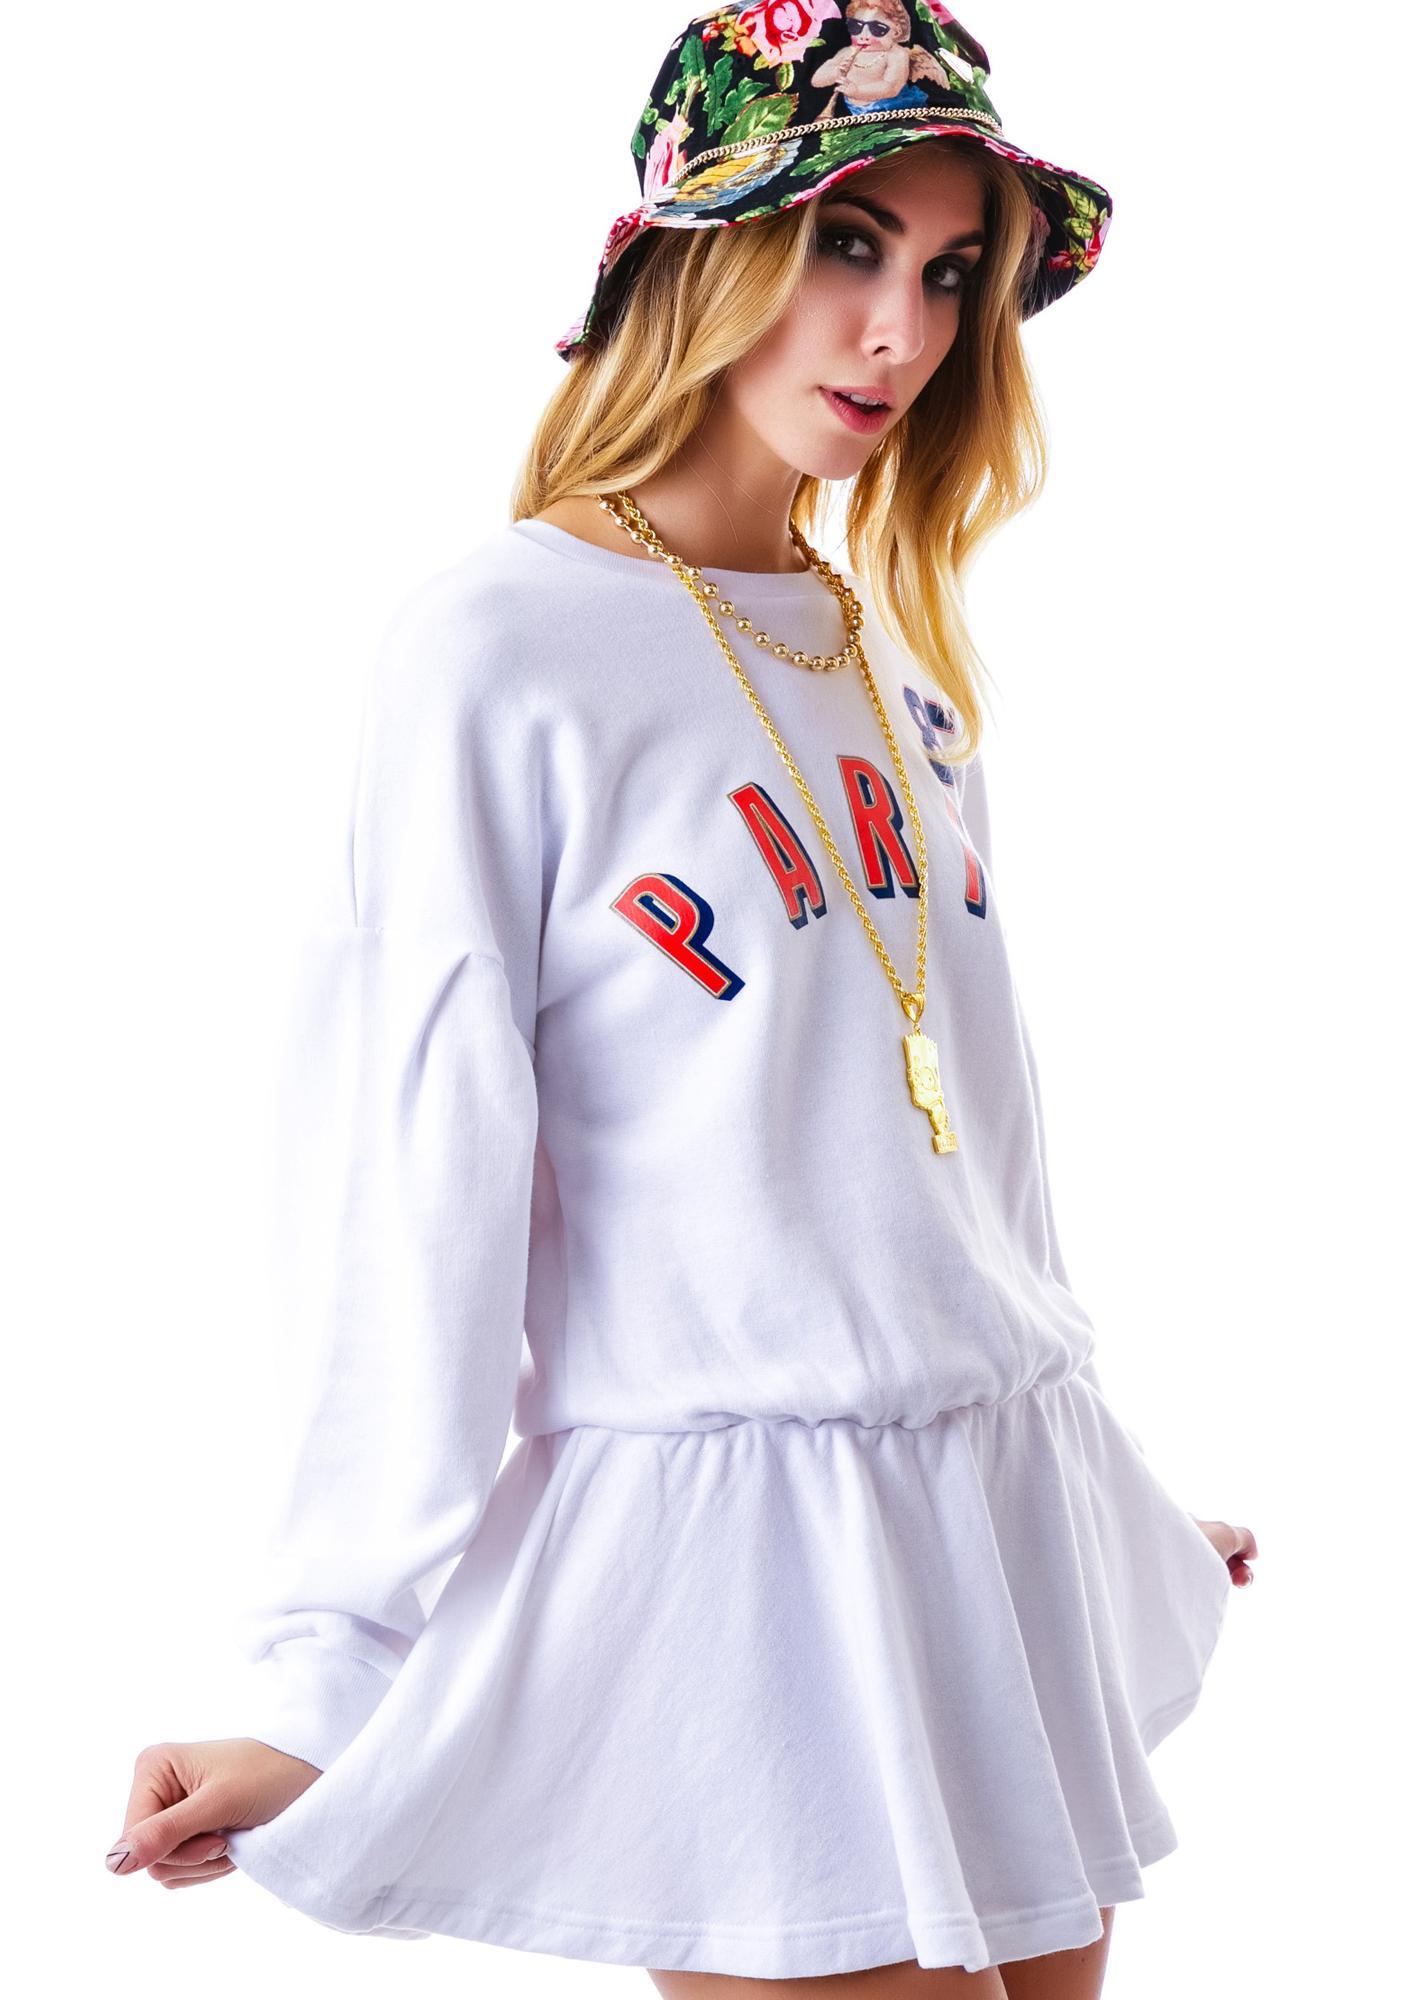 Joyrich Paris 85 Tunic Dress